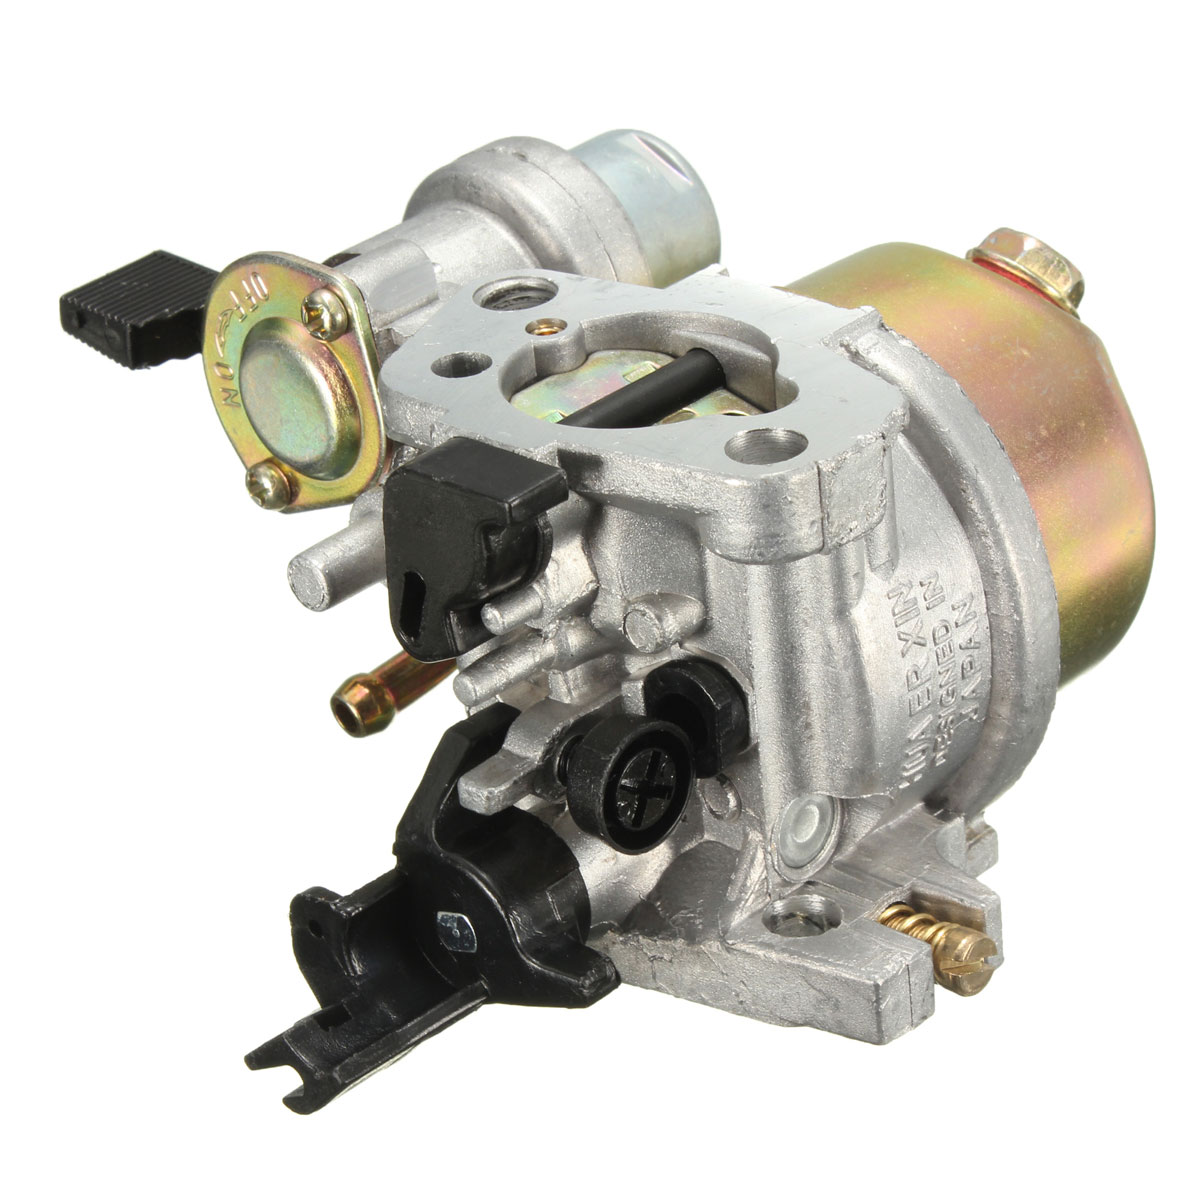 Replacement carburetor carb for honda gx110 gx120 110 120 for Honda motor credit payoff